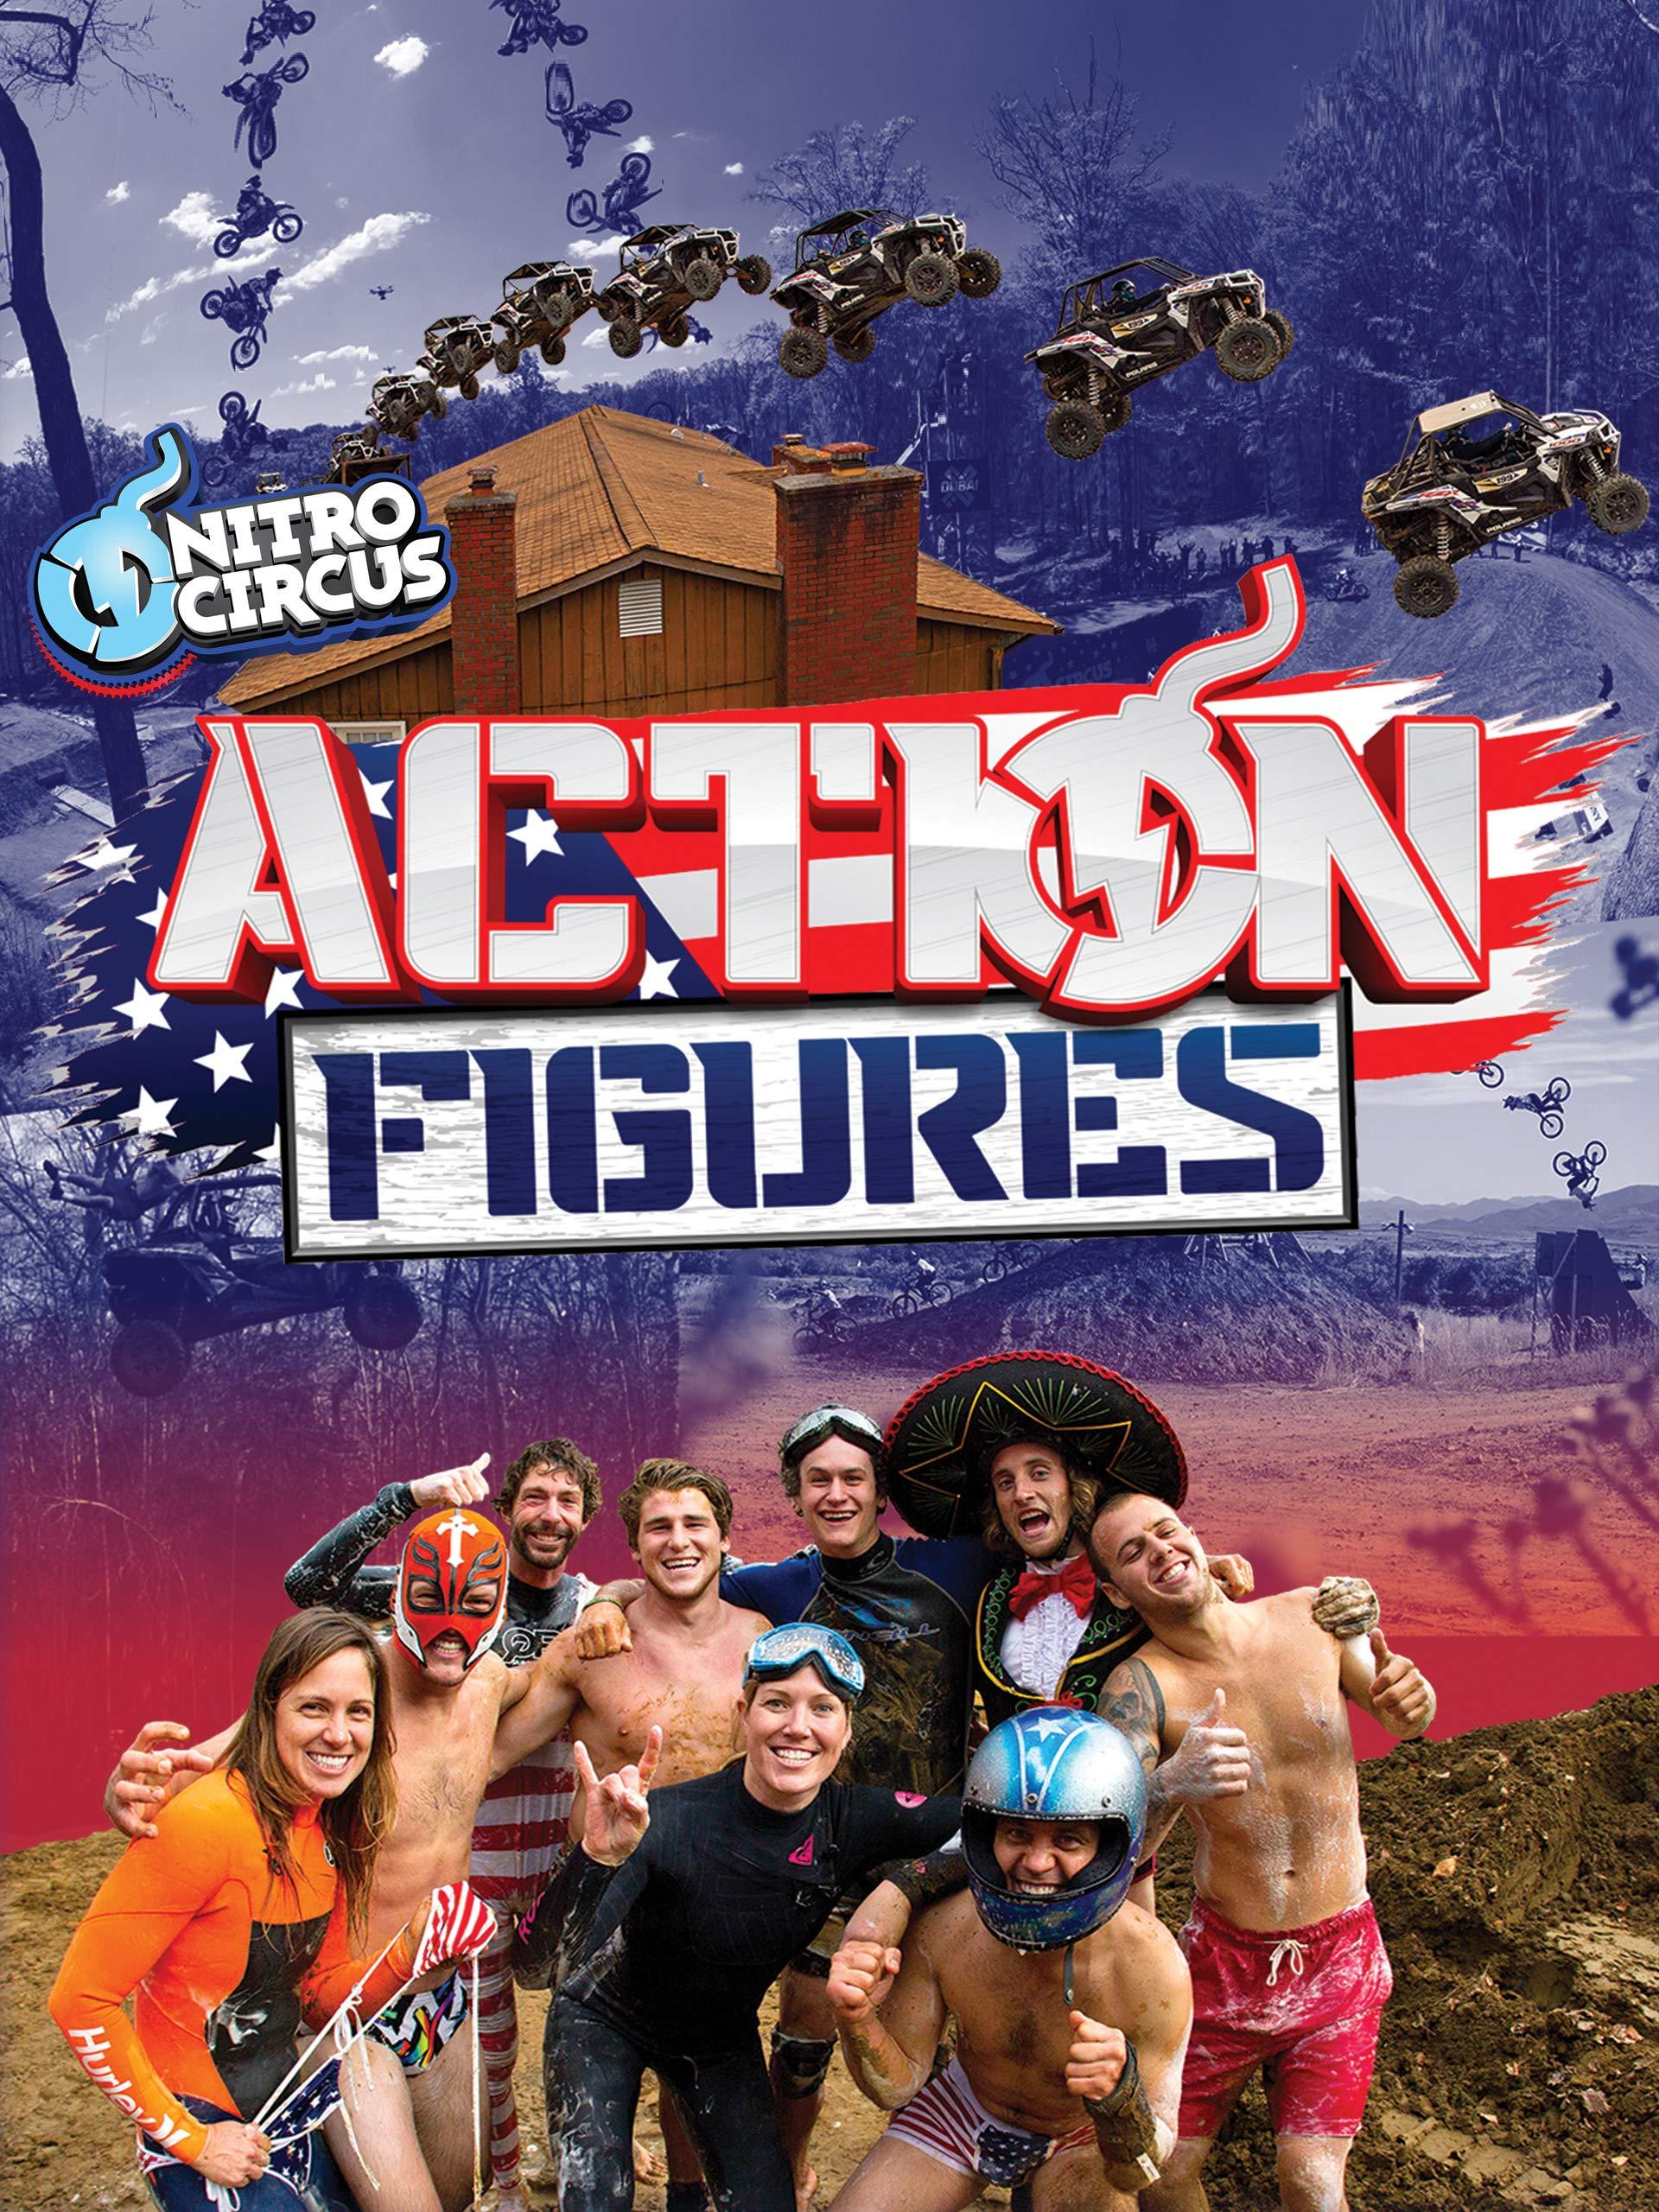 Action Figures: Nitro Circus on Amazon Prime Video UK